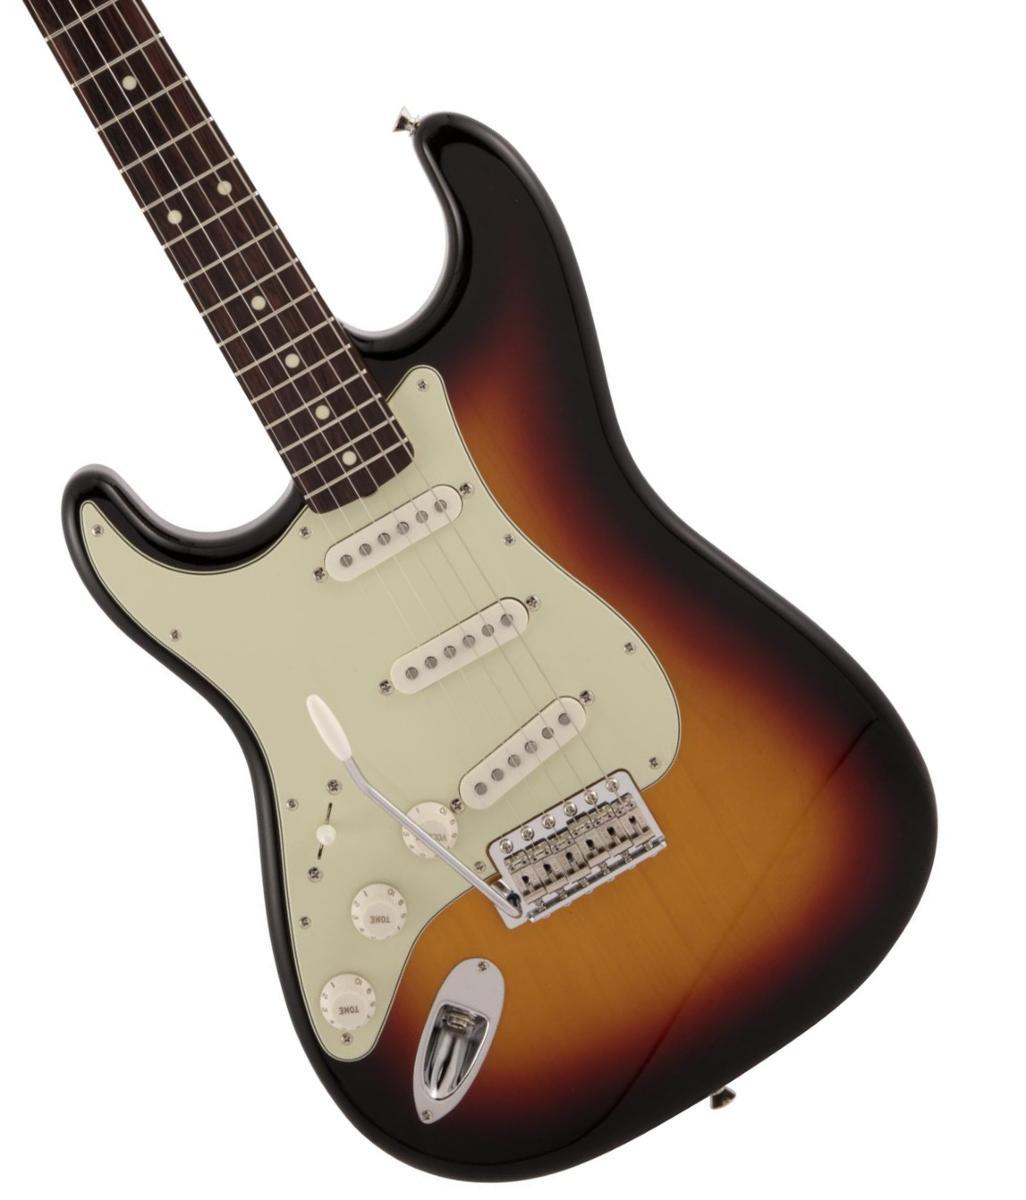 Fender / Made in Japan Traditional 60s Stratocaster Left-Handed Rosewood Fingerboard 3-Color Sunburst【2020 NEW MODEL】《純正ケーブル&ピック1ダースプレゼント!/+661944400》